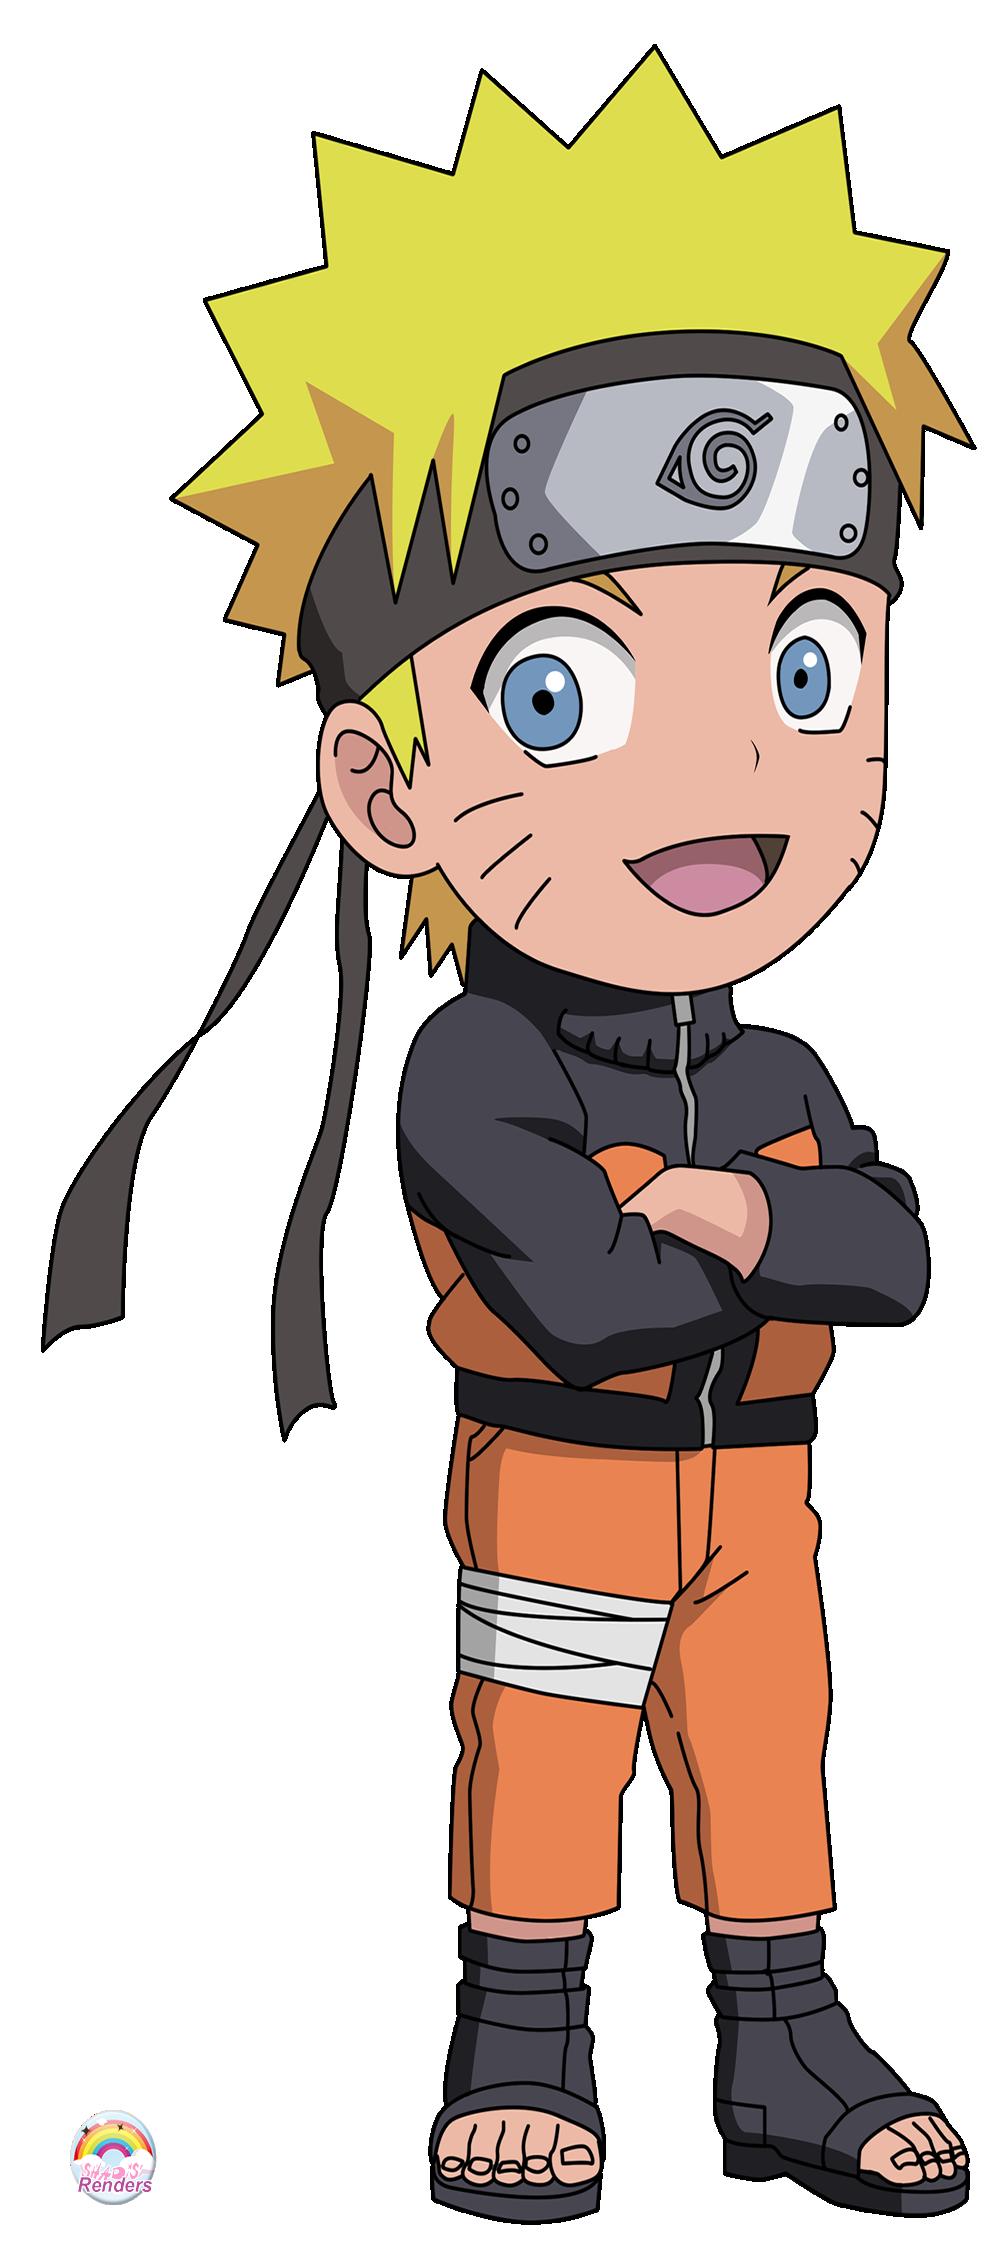 Naruto uzumaki chibi read naruto manga online naruto naruto naruto free naruto uzumaki - Naruto chibi images ...